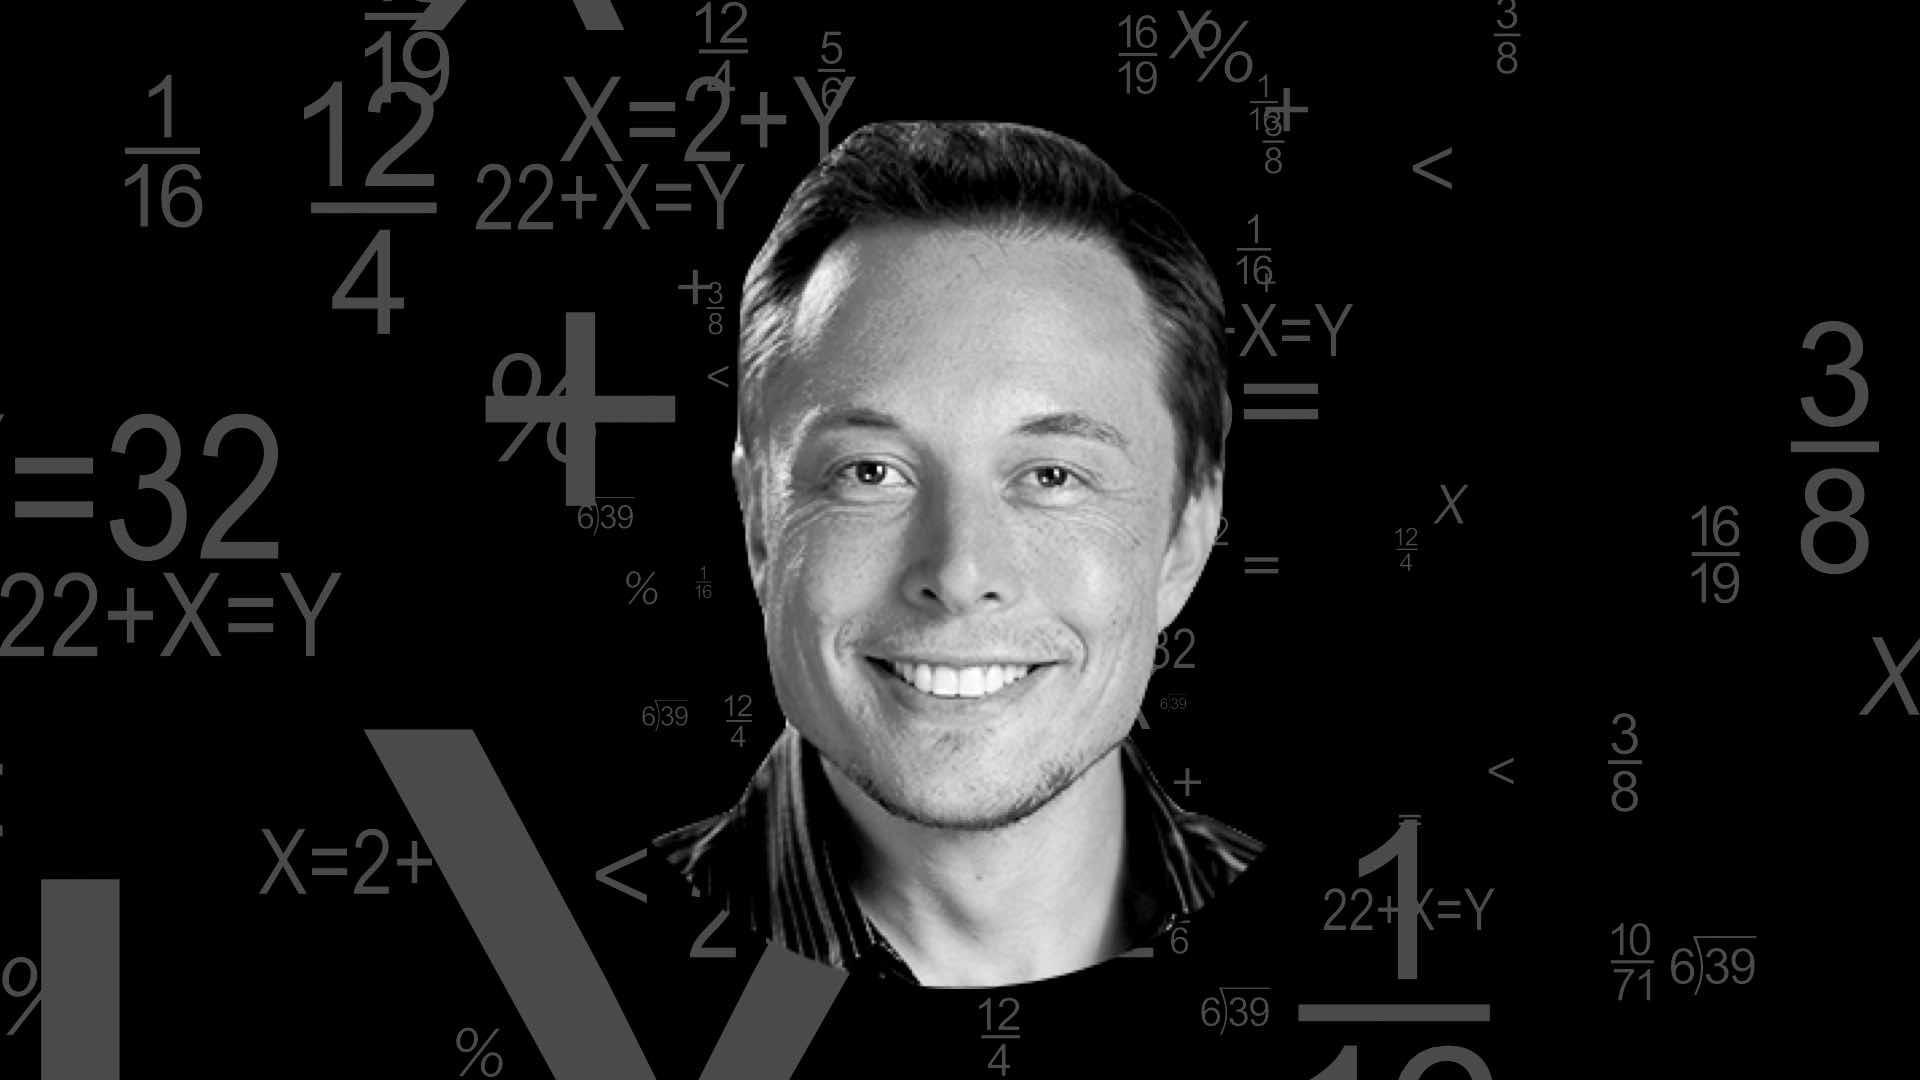 Iphone X Verge Wallpaper Elon Musk Wallpaper 82 Images